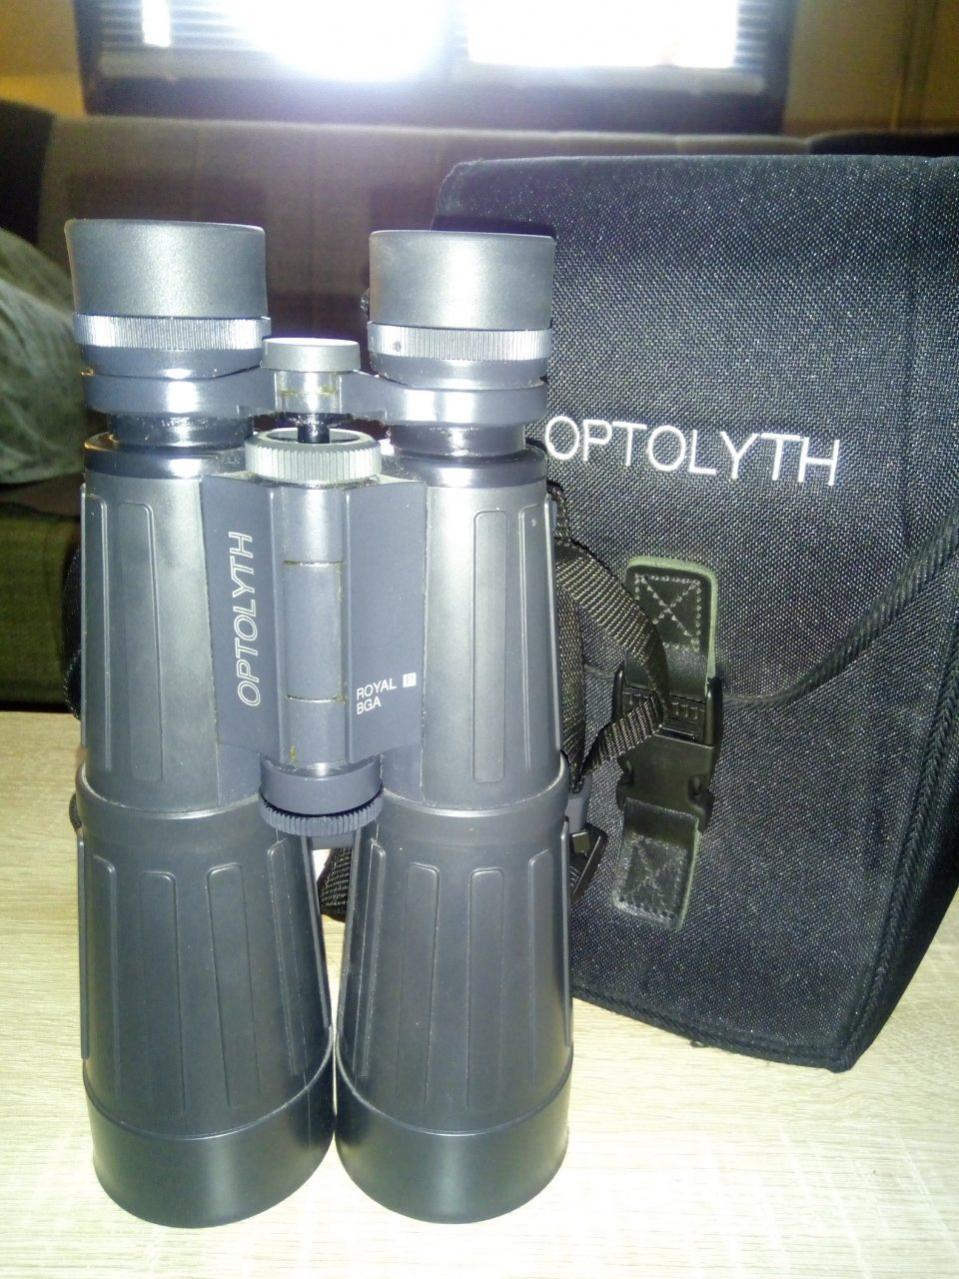 OptolythrojalP15x633.jpg